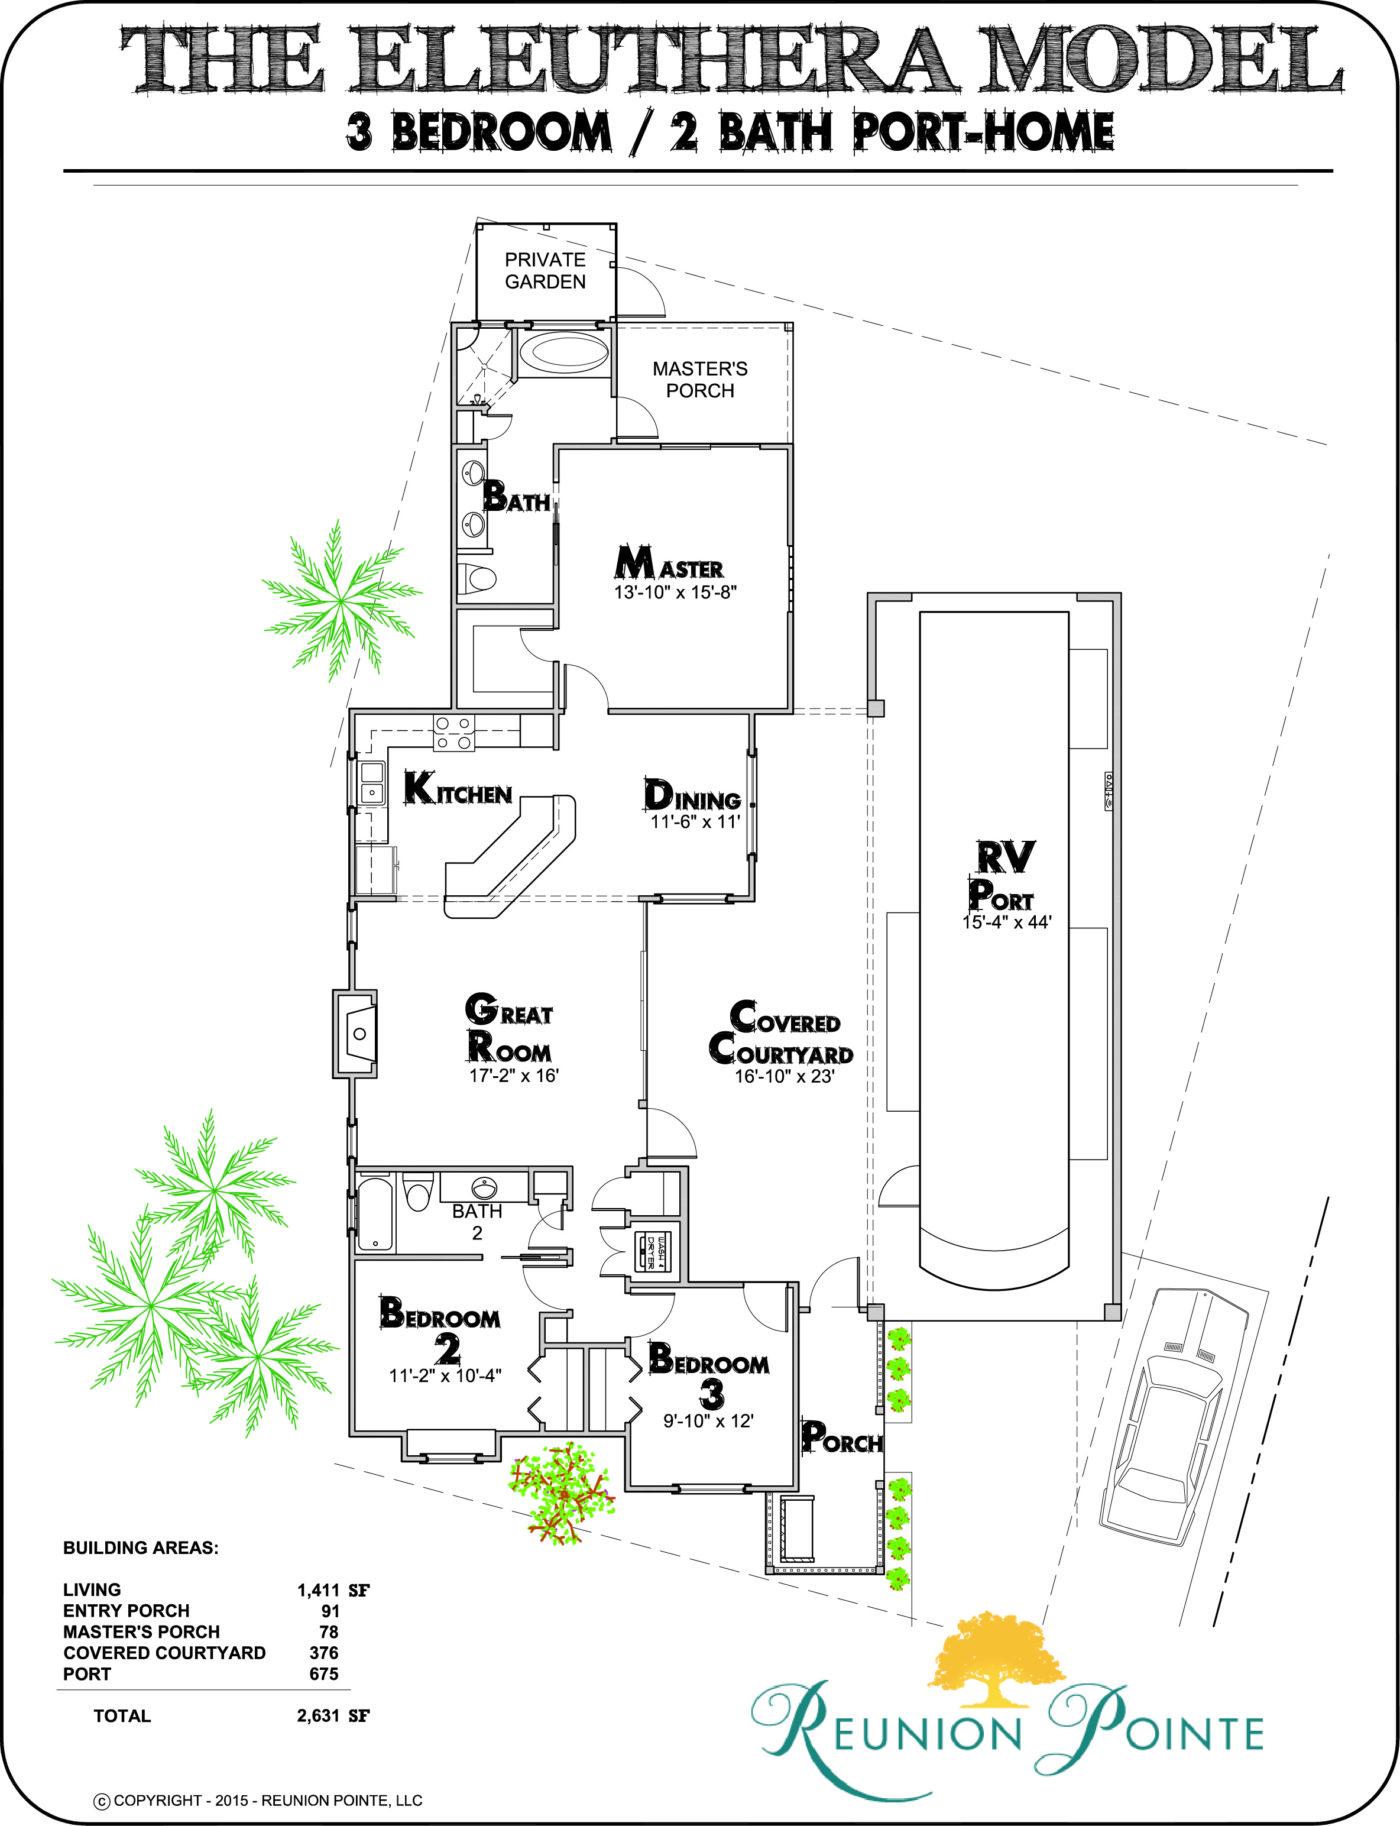 Eleuthera RV Port-Home Model Floorplan